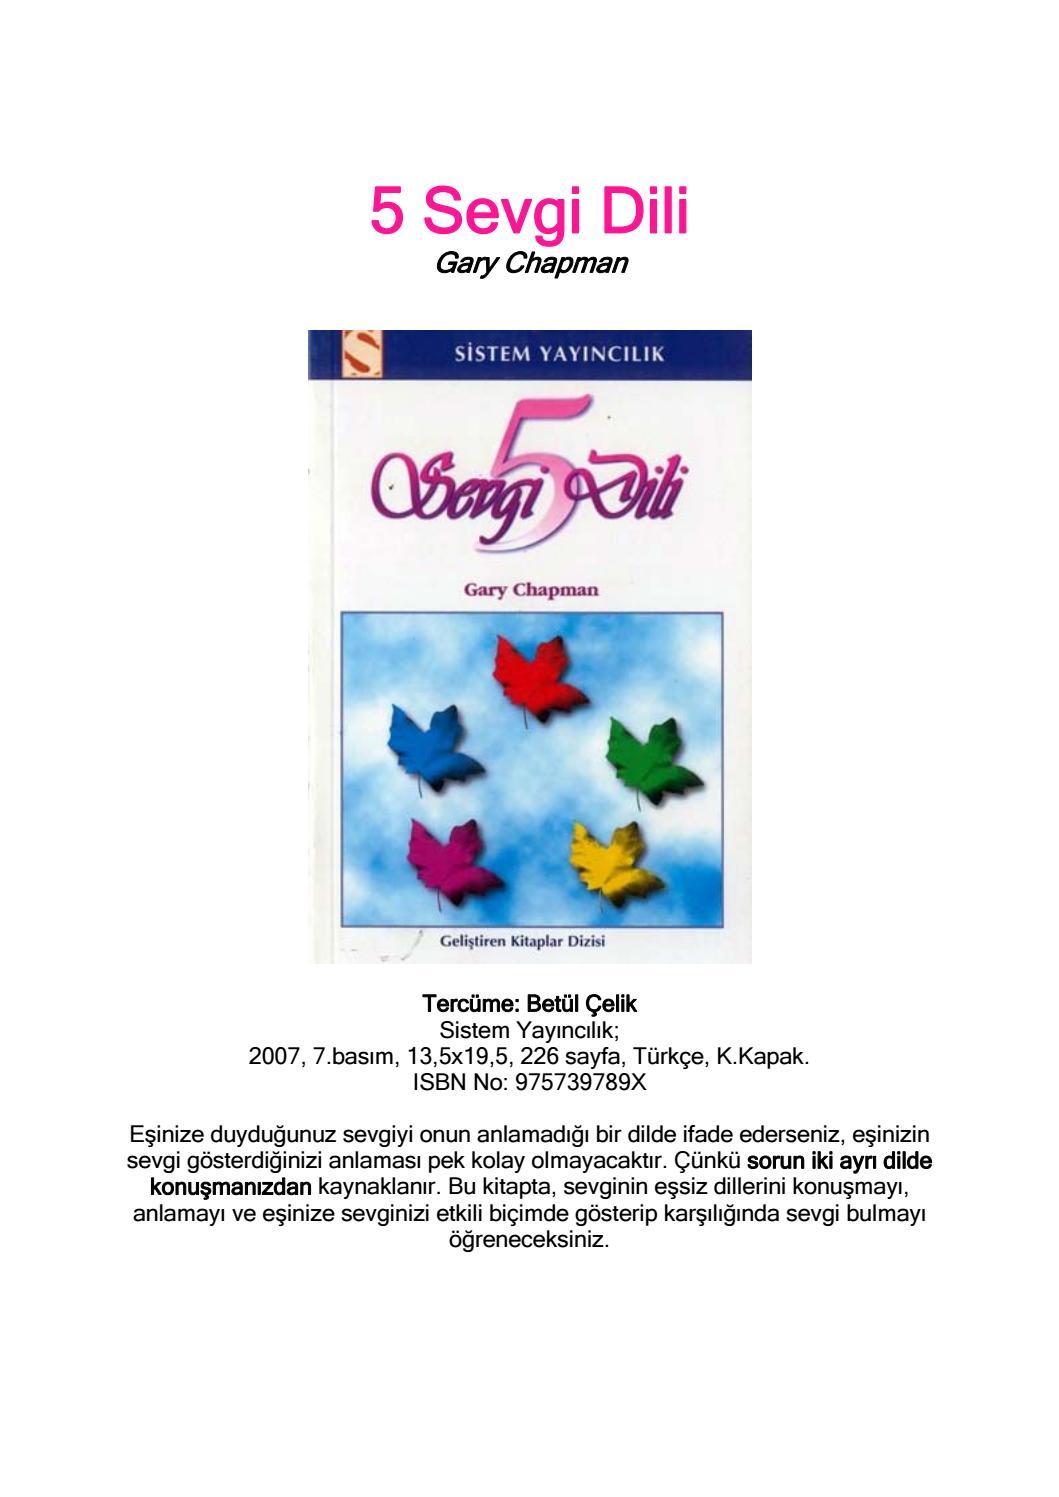 5 Sevgi Dili Garry Chapman By M Sahin Cil Issuu